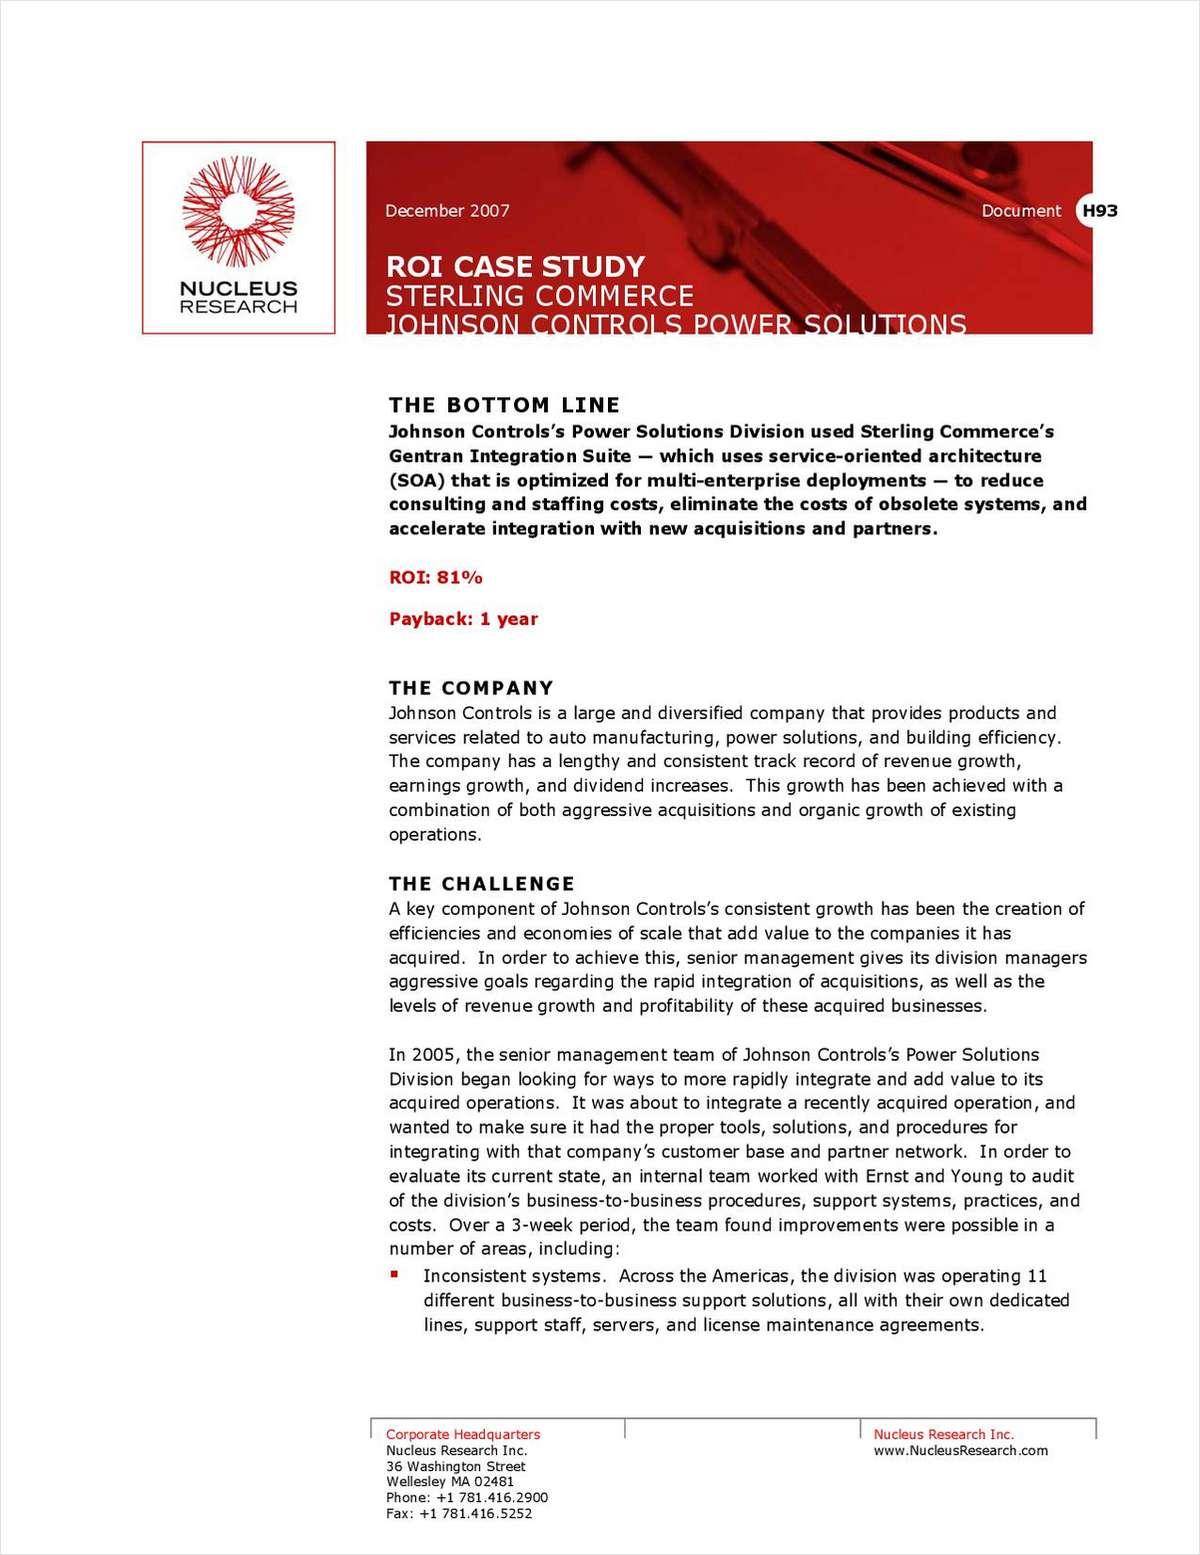 ROI Case Study: Johnson Controls Power Solutions